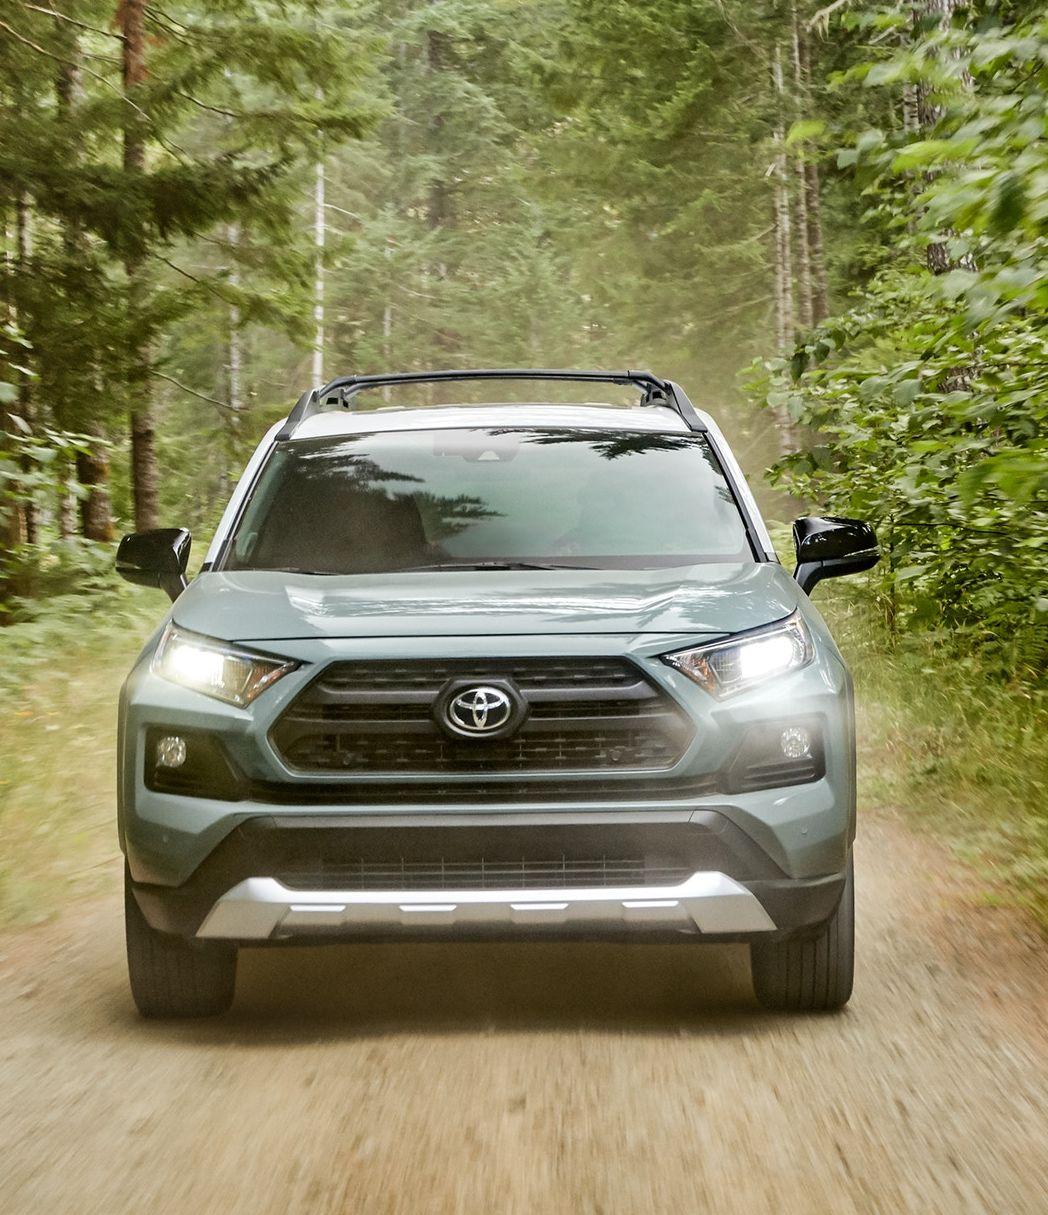 2019 Toyota Rav4: 2019 Toyota RAV4 Leasing Near Cedar Rapids, IA